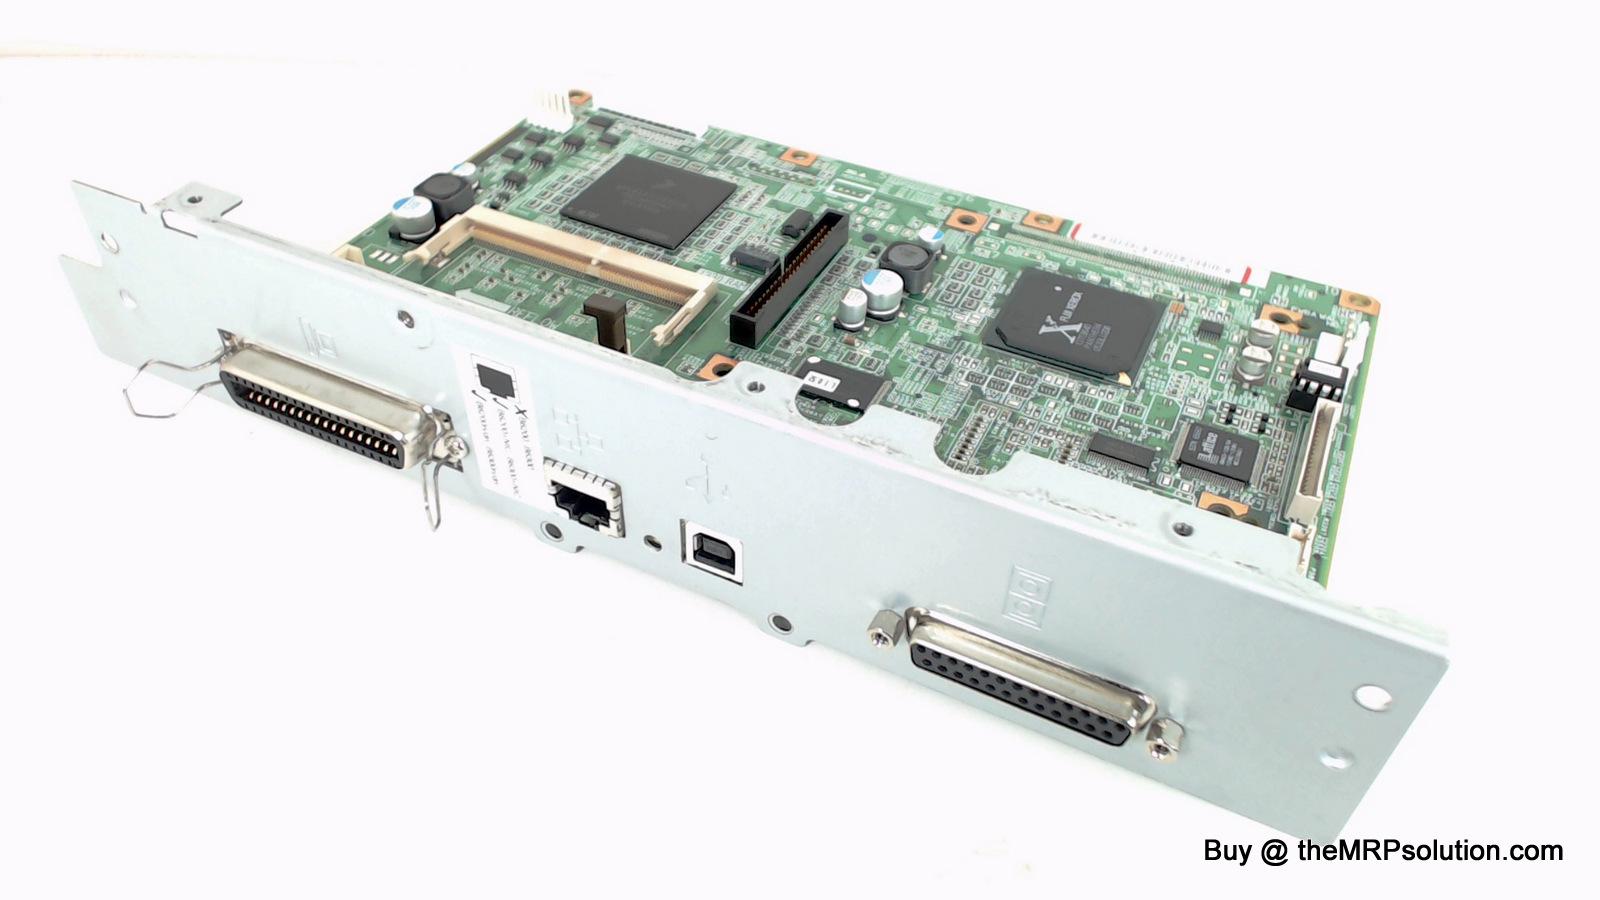 OKIDATA 55090301 PWV, ESS, B6300 Refurbished